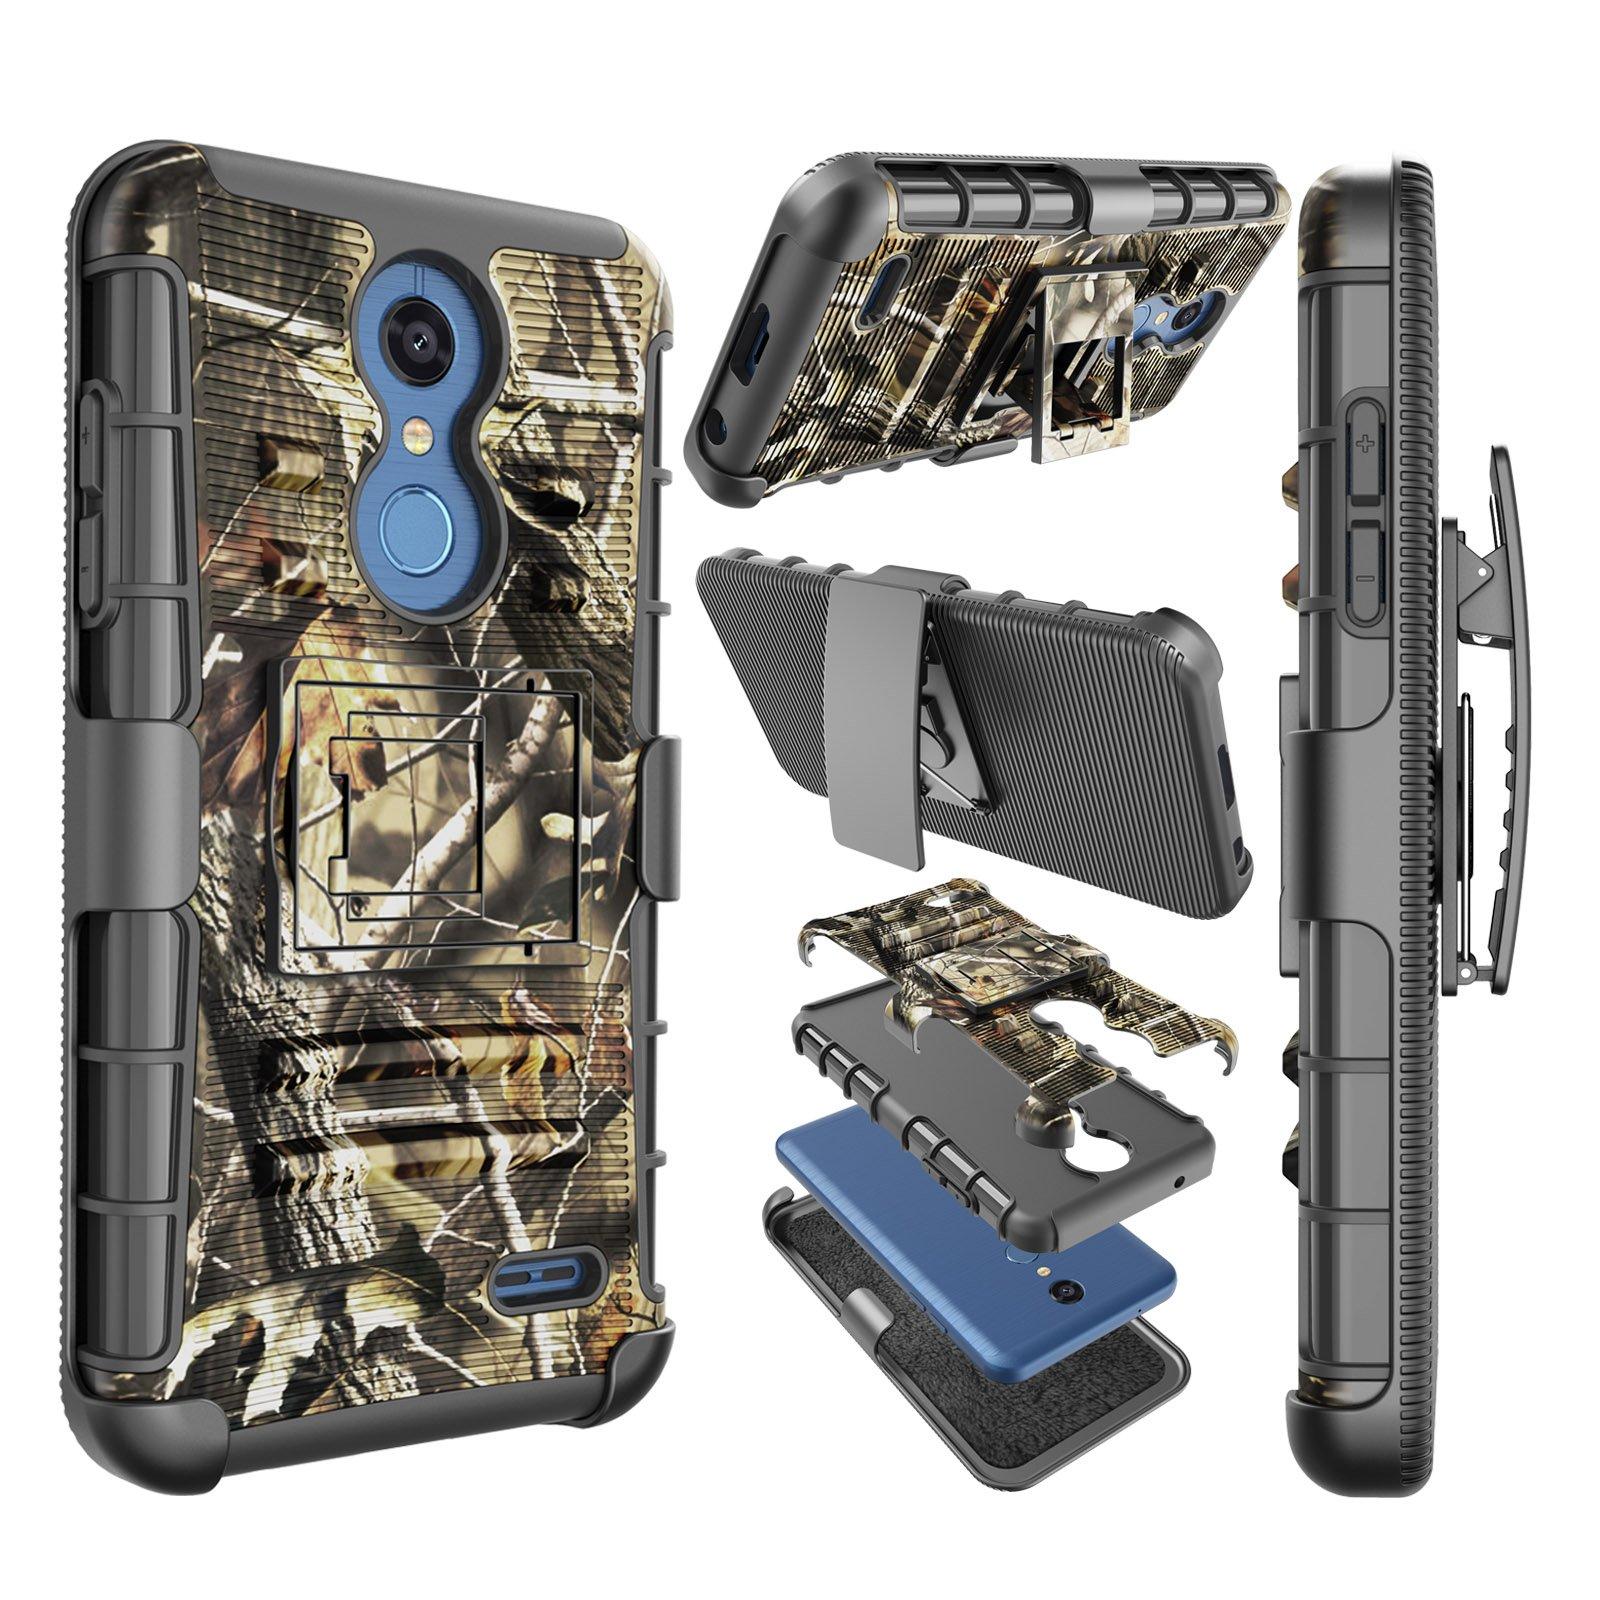 Njjex LG K30 Case, LG Premier Pro LTE/Xpression Plus/K30